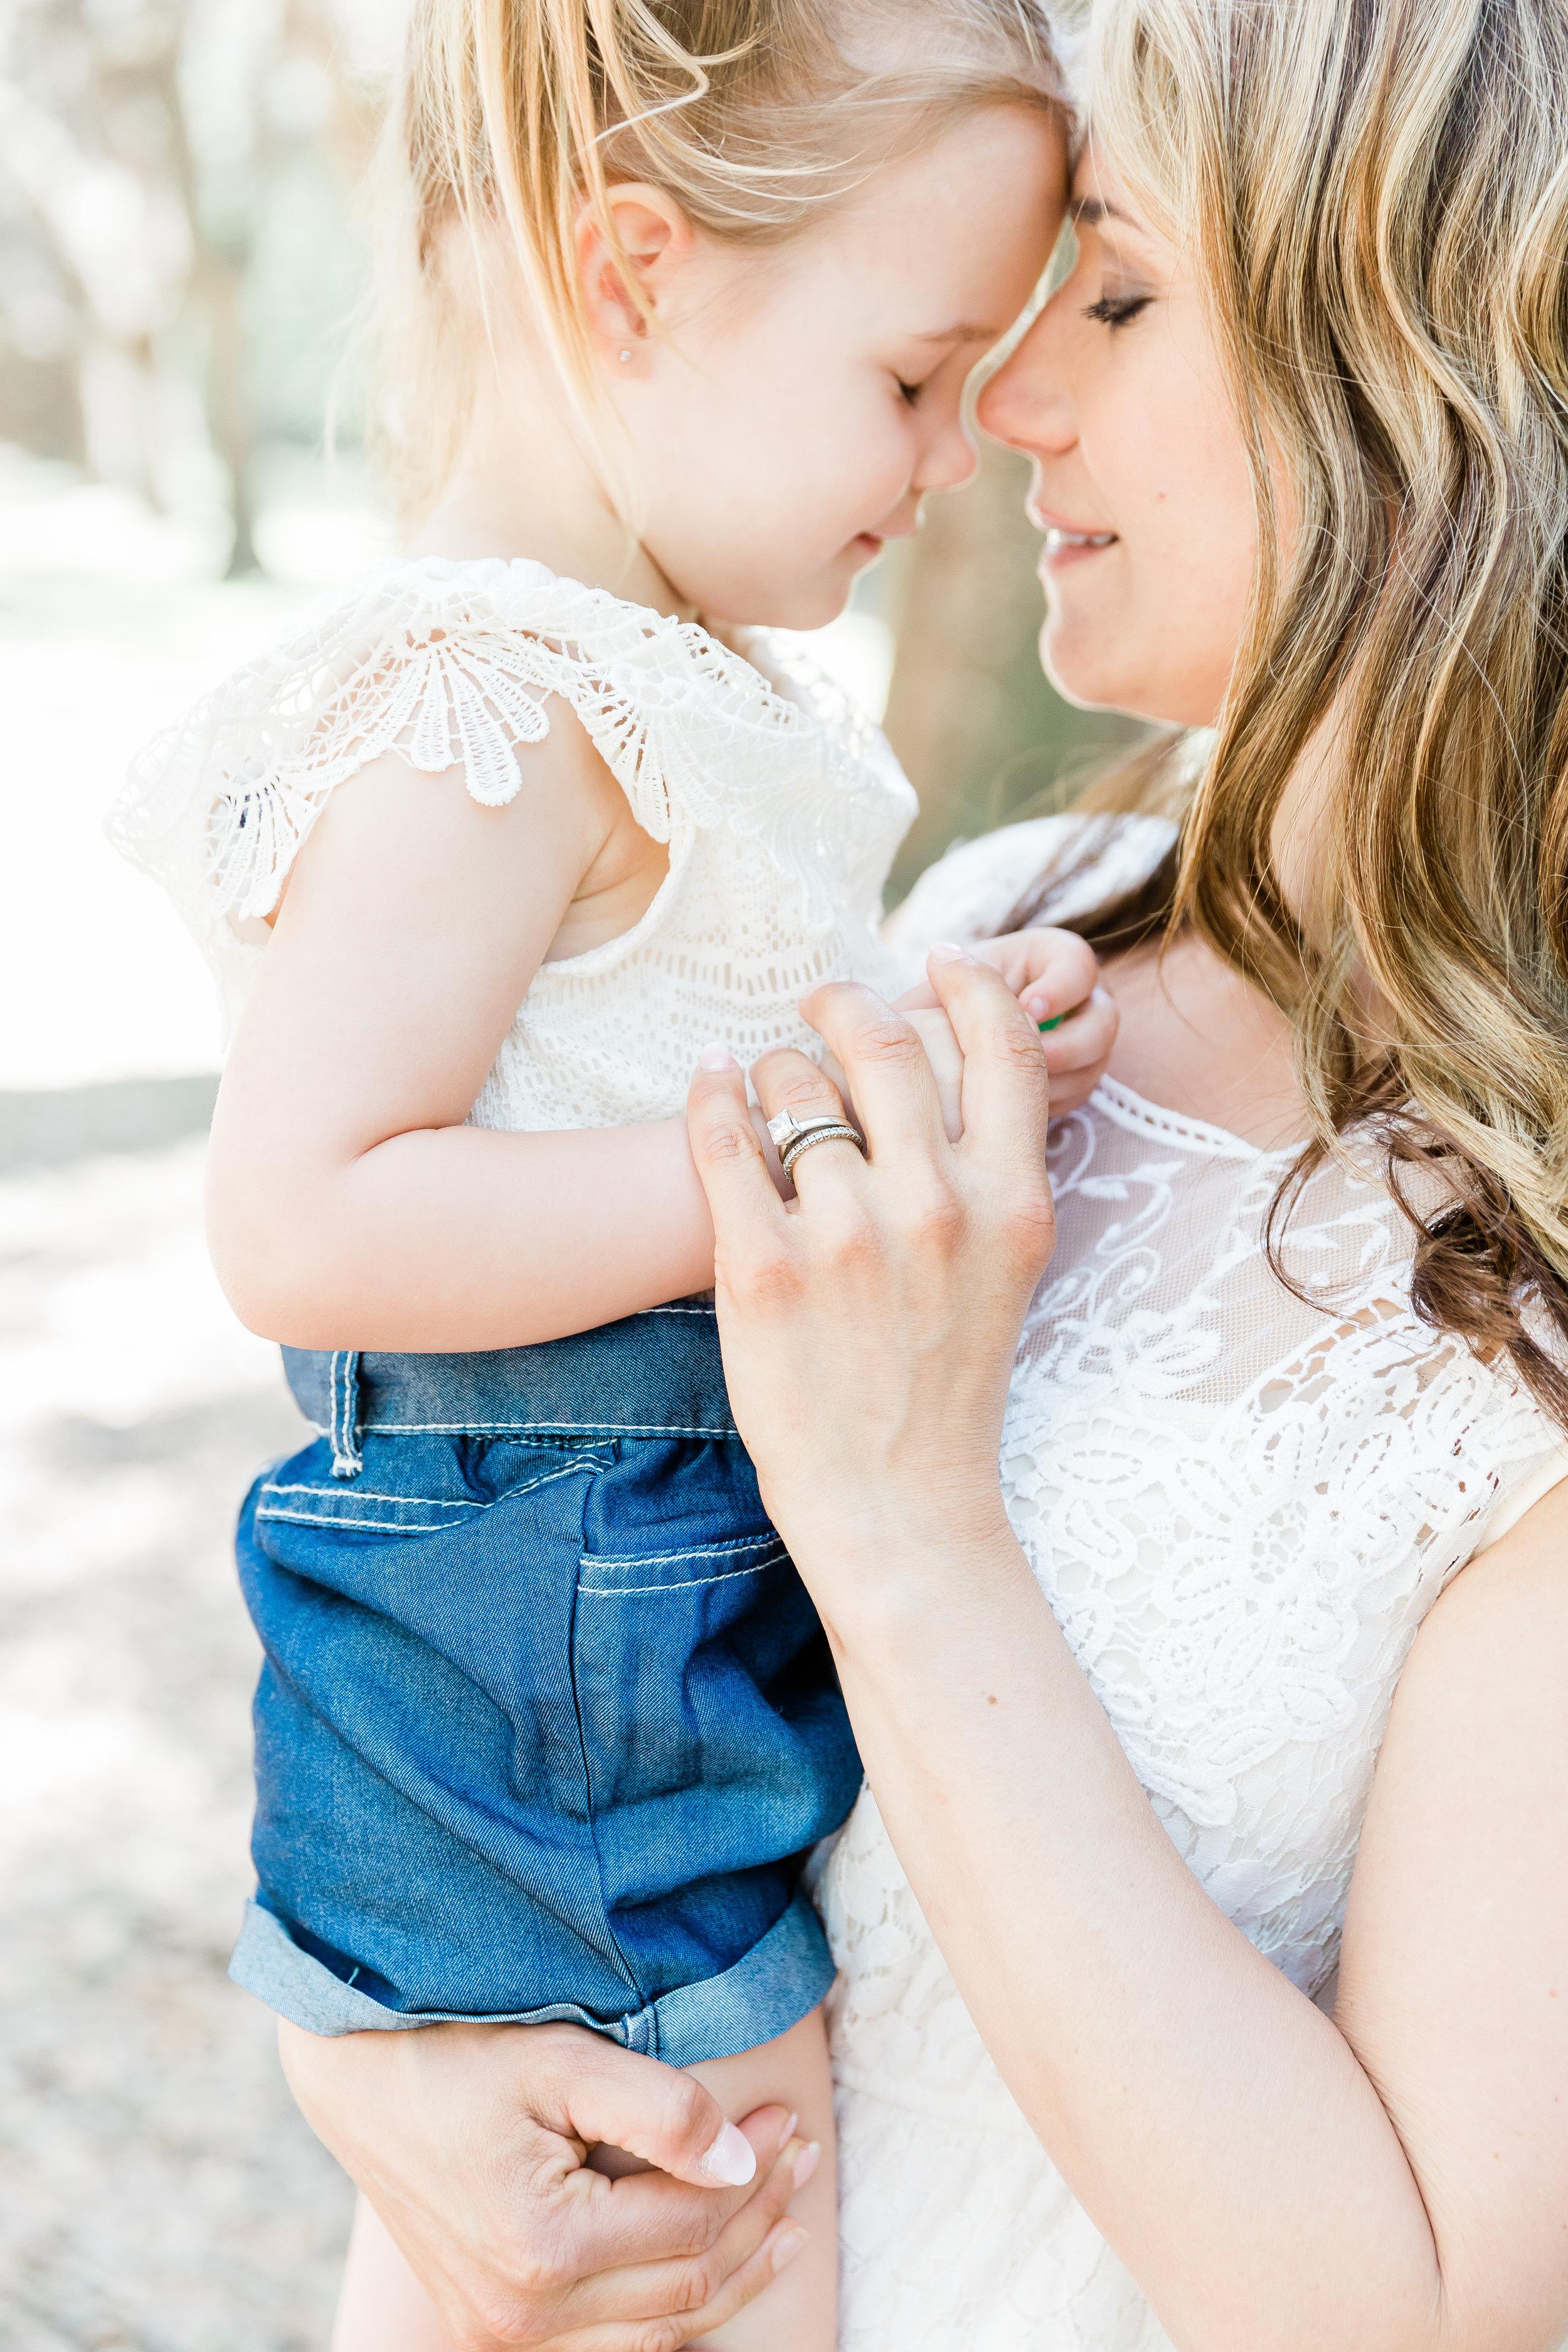 20190416-Southern Lens Photography-savannah family photographer- Kristy & Dave Family-201905.jpg